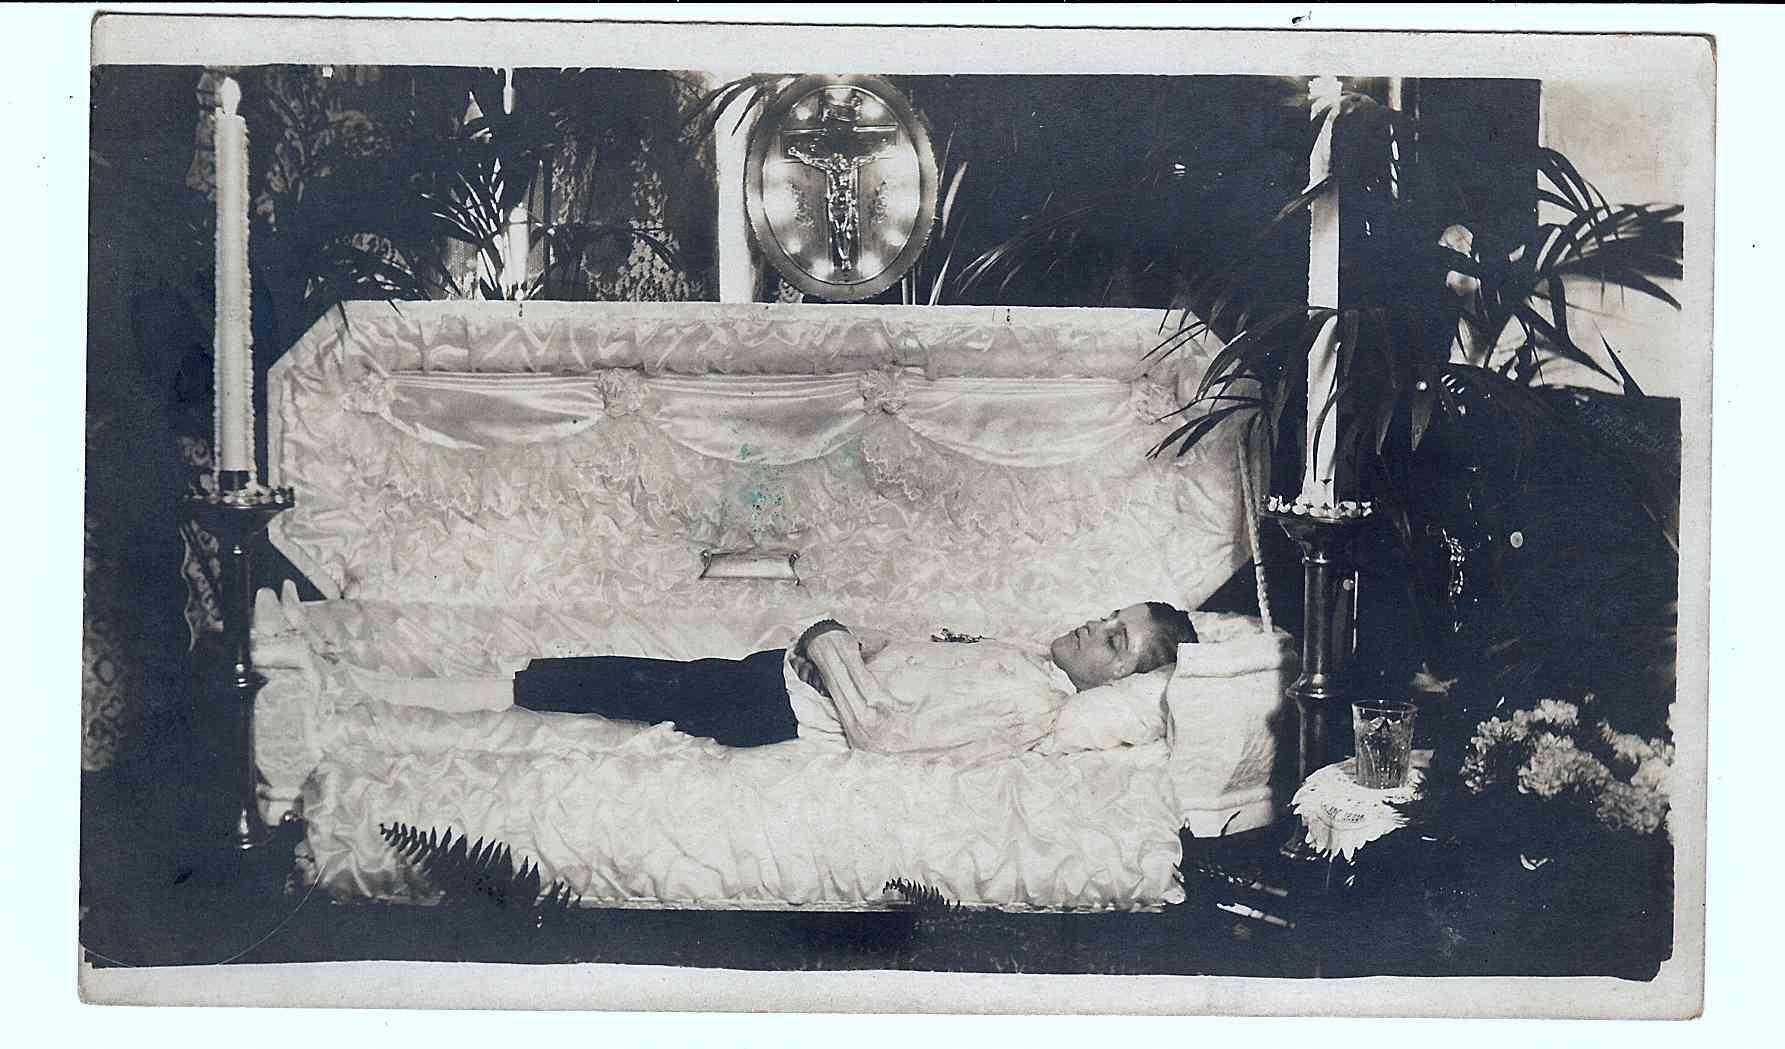 accident victim in coffin Dec 1915.jpg (1785×1049)